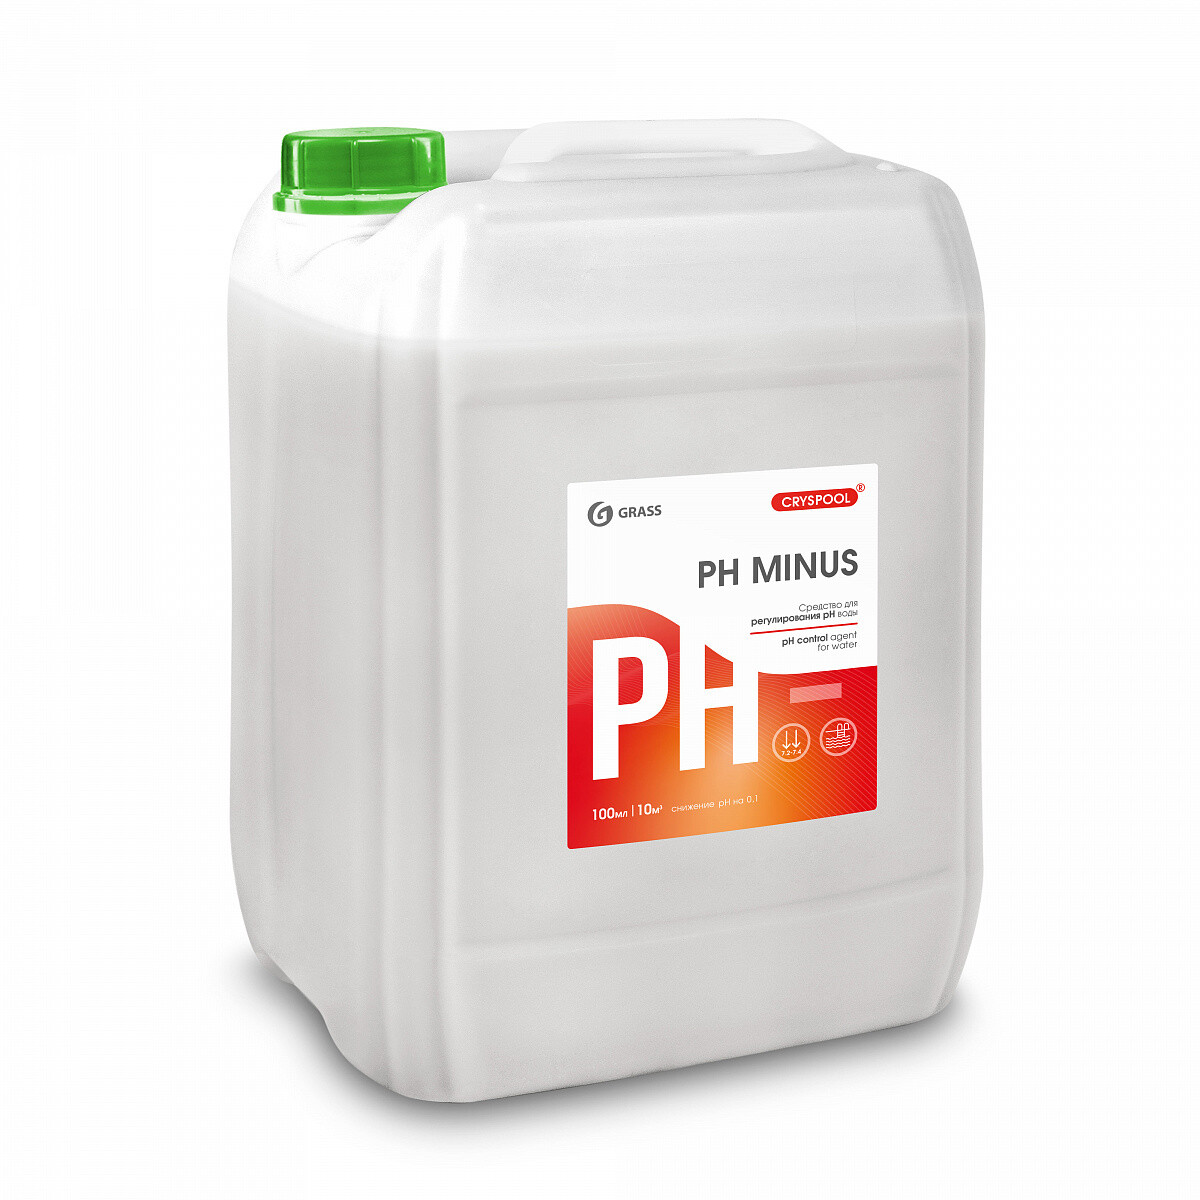 Средство для регулирования pH воды CRYSPOOL pH minus, канистра 23 кг